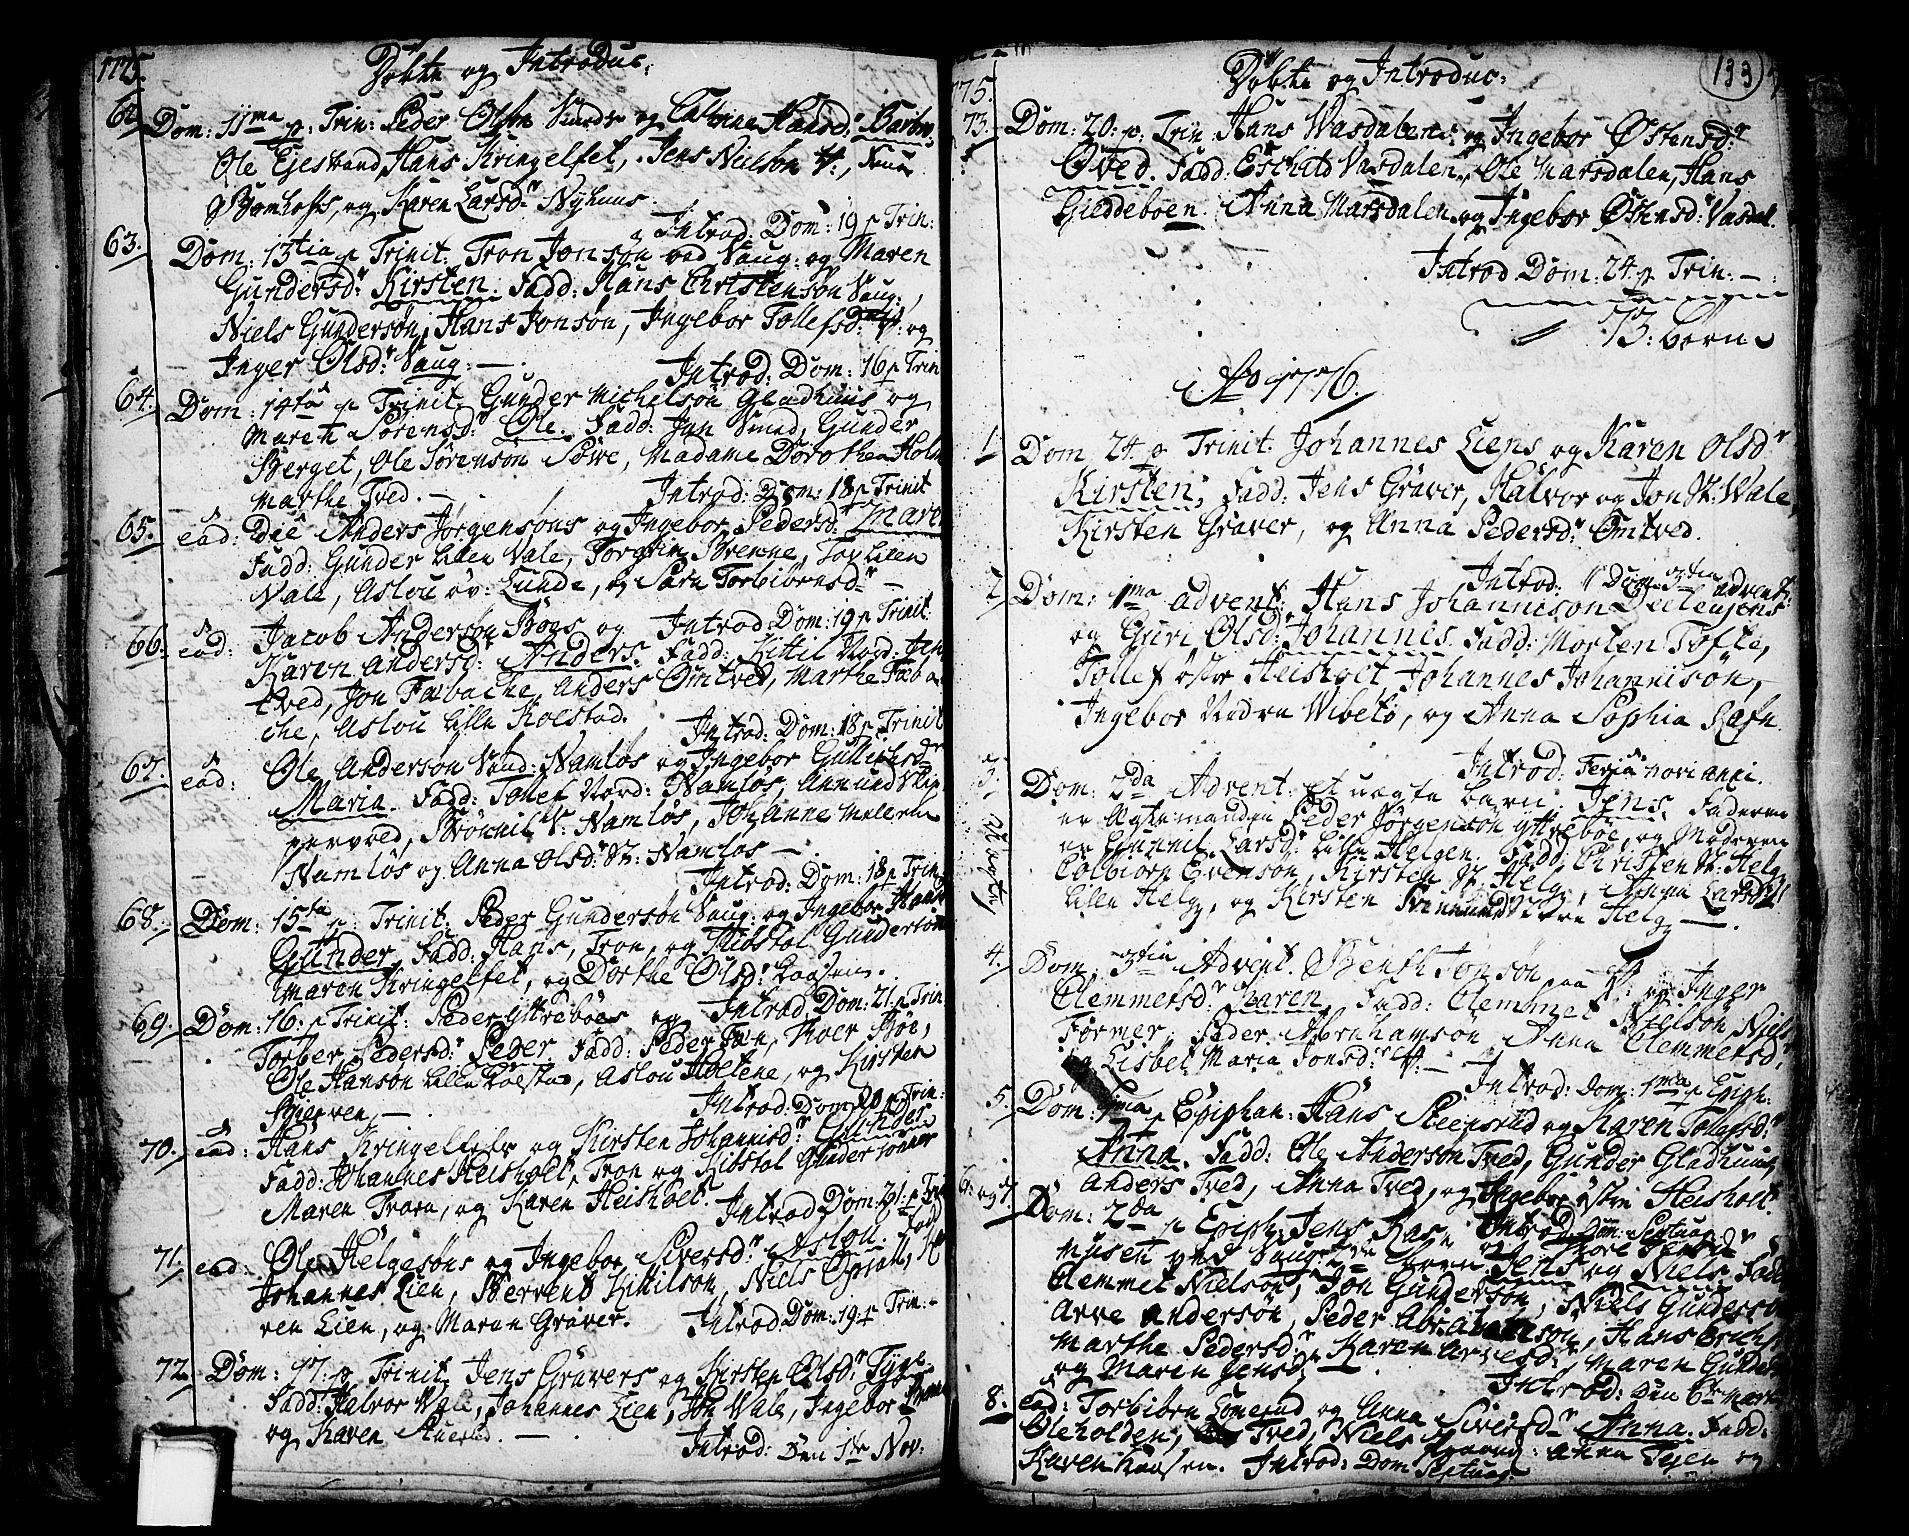 SAKO, Holla kirkebøker, F/Fa/L0001: Ministerialbok nr. 1, 1717-1779, s. 133